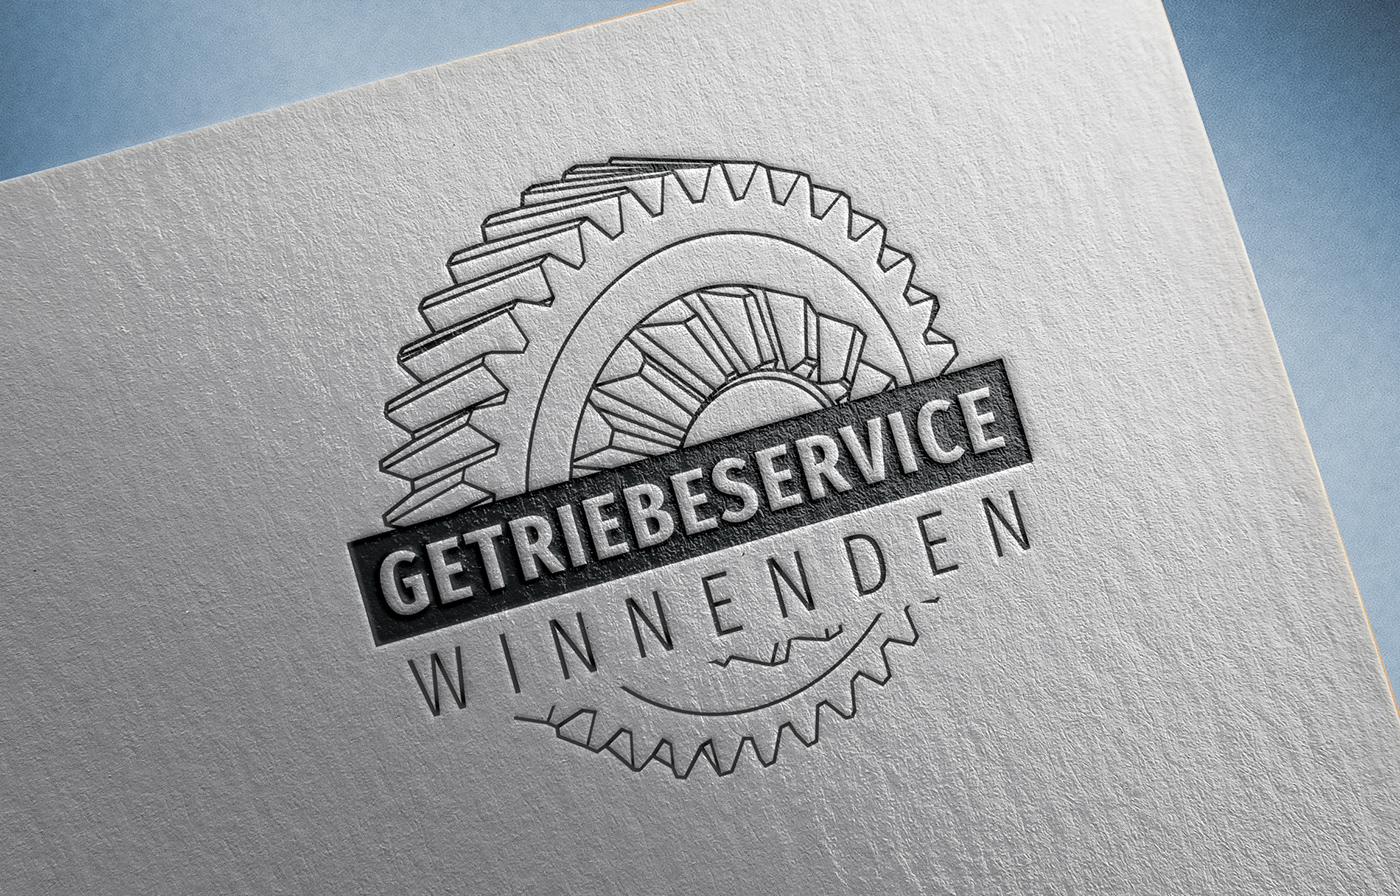 #corporatedesign branding  colors corporatebranding design ILLUSTRATION  image Photography  styleguide typography